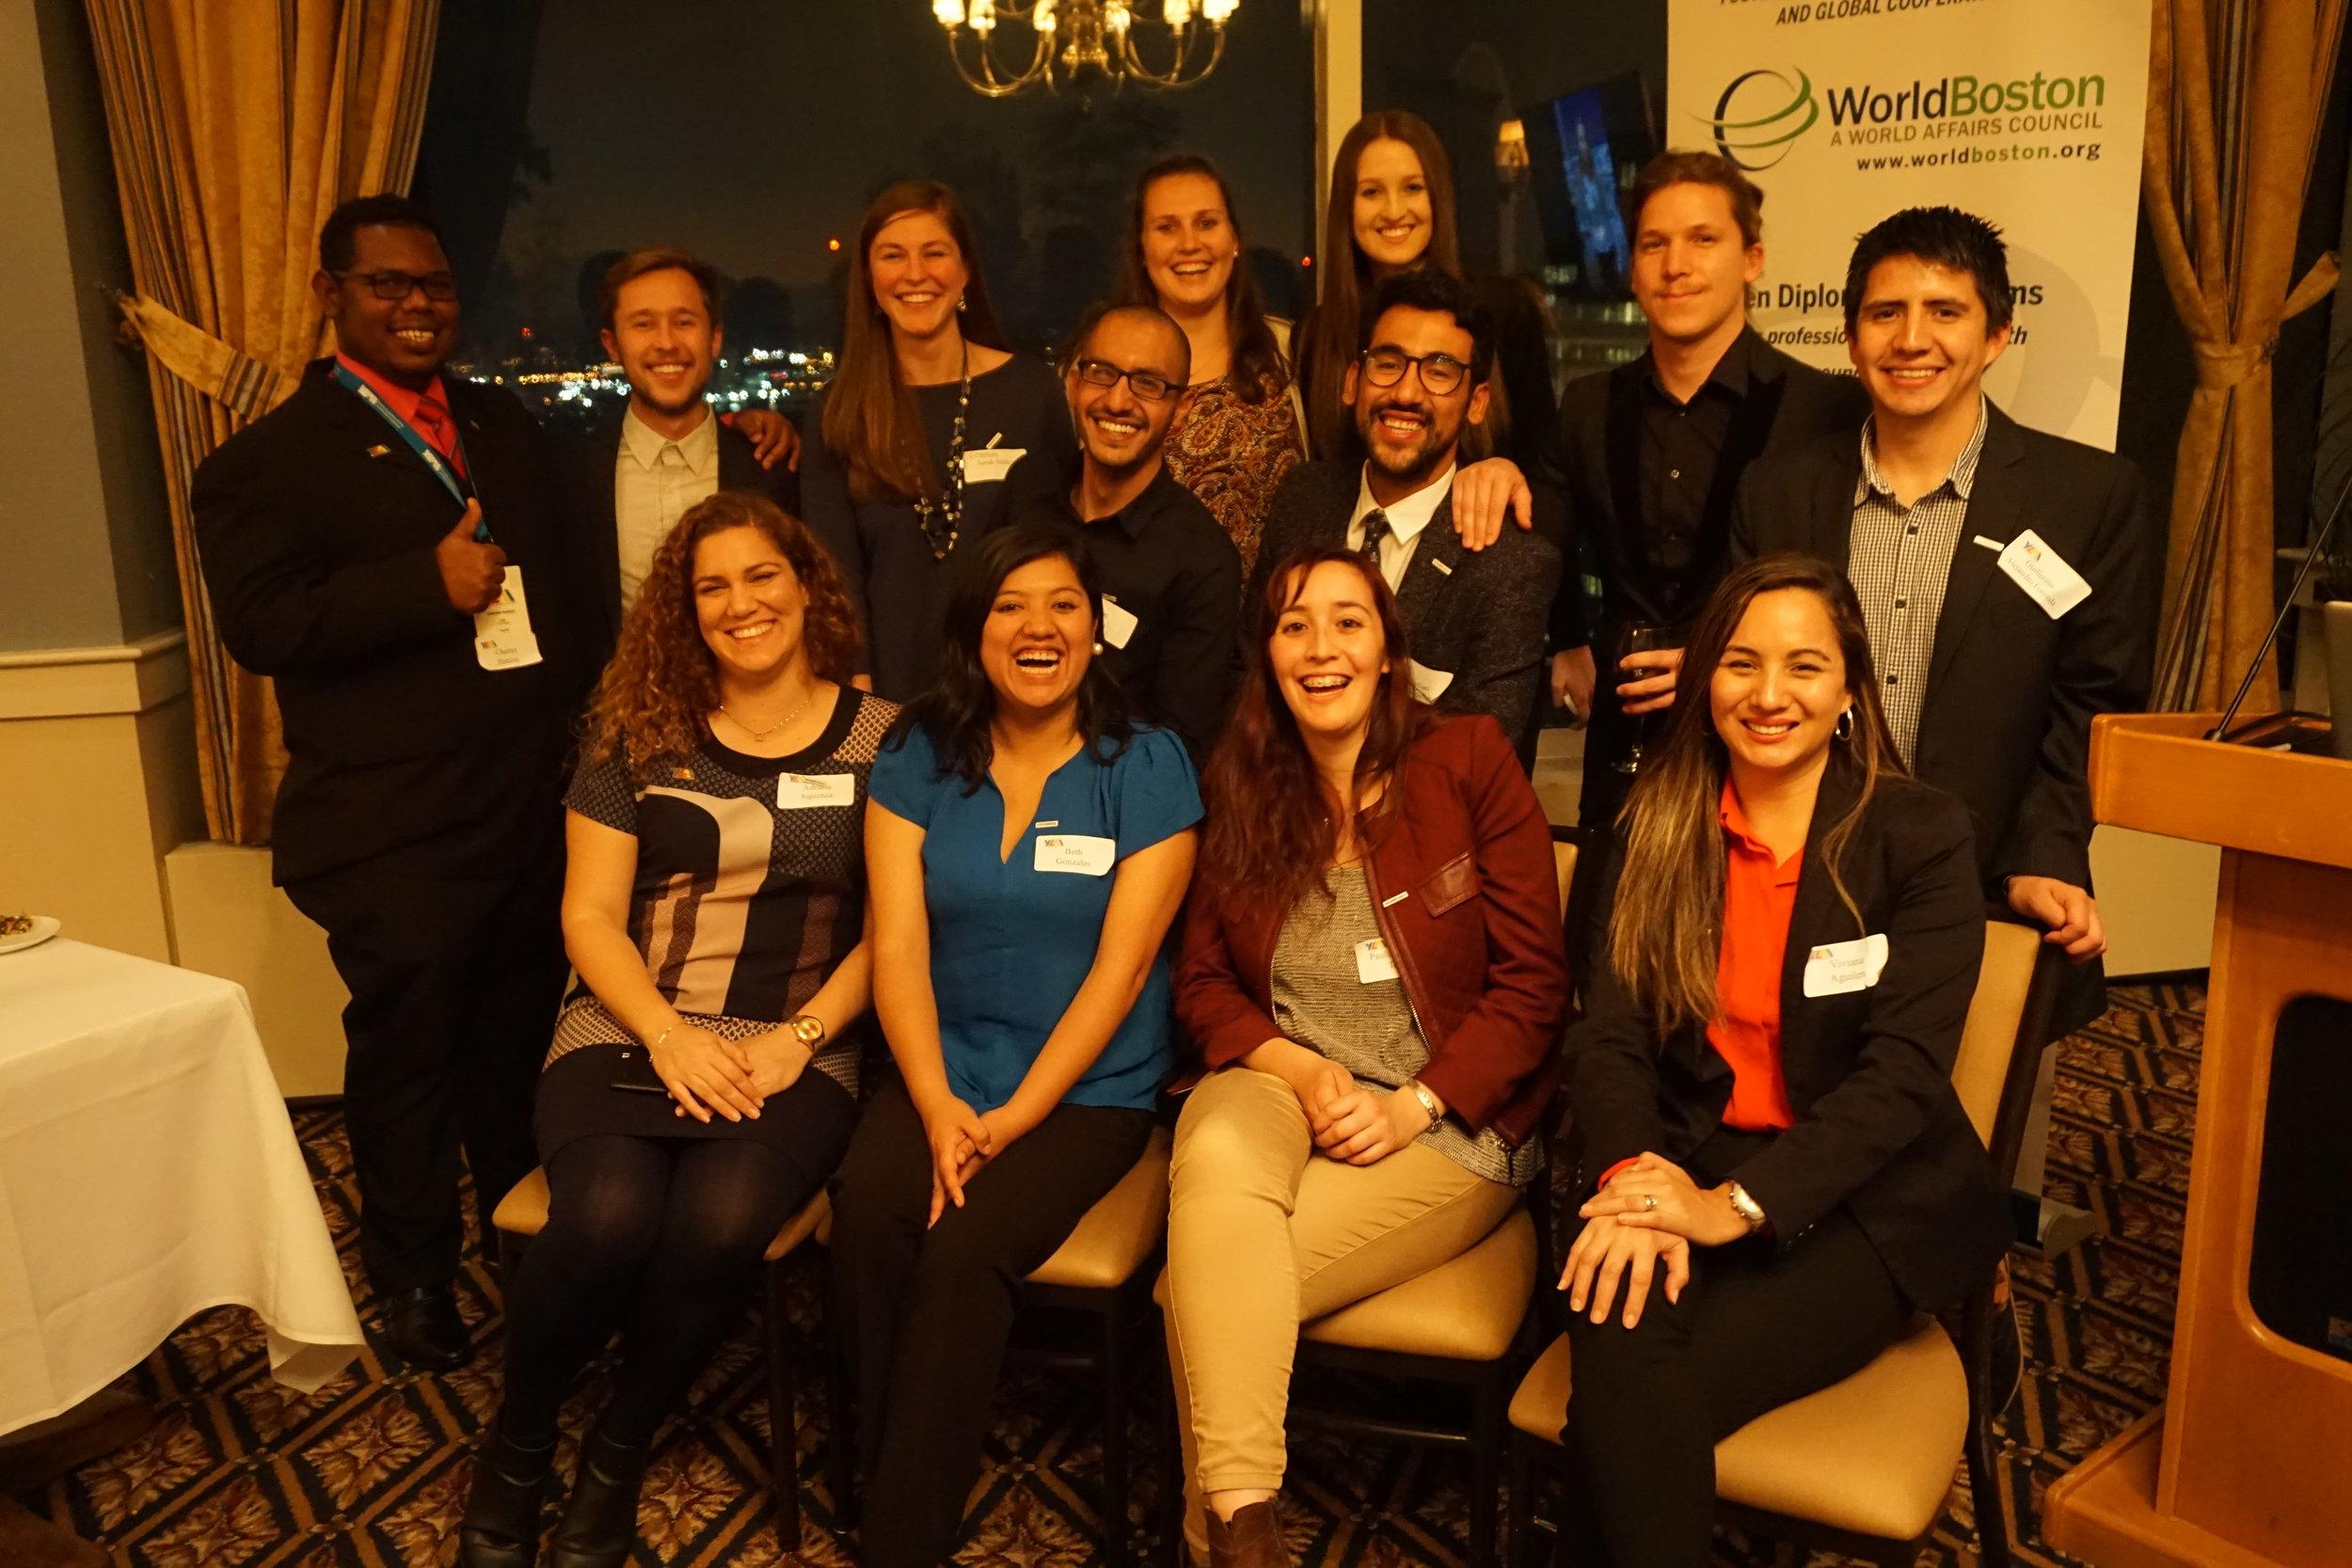 WorldBoston's 2017 YLAI Professional Fellows with organizers Sarah, Jenna, and Maddie